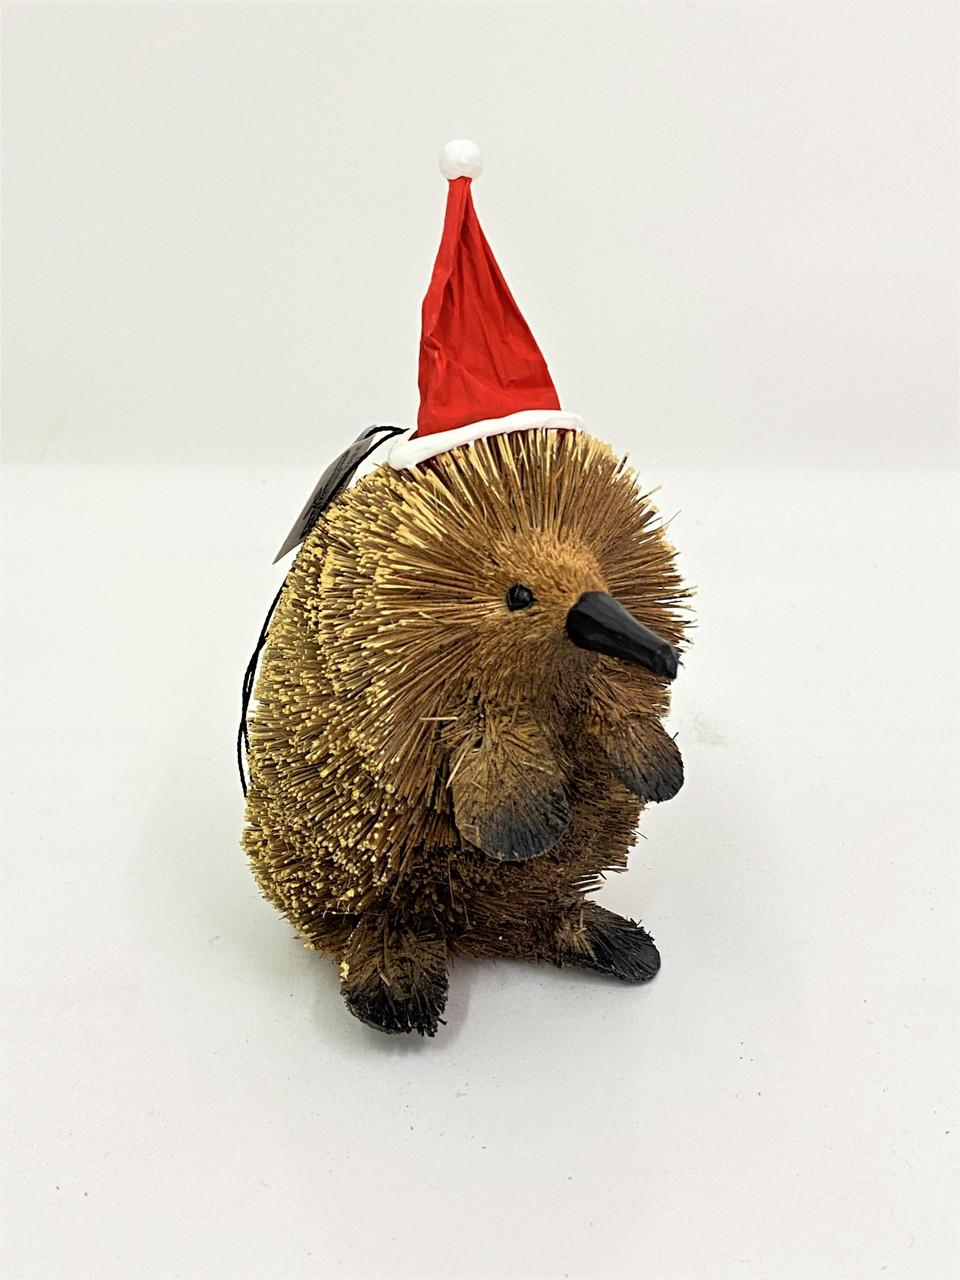 AUSSIE CHRISTMAS MANTLE SET - KANGA, EMU, ECHIDNA - 13cm BRISTLEBRUSH Christmas Decoration